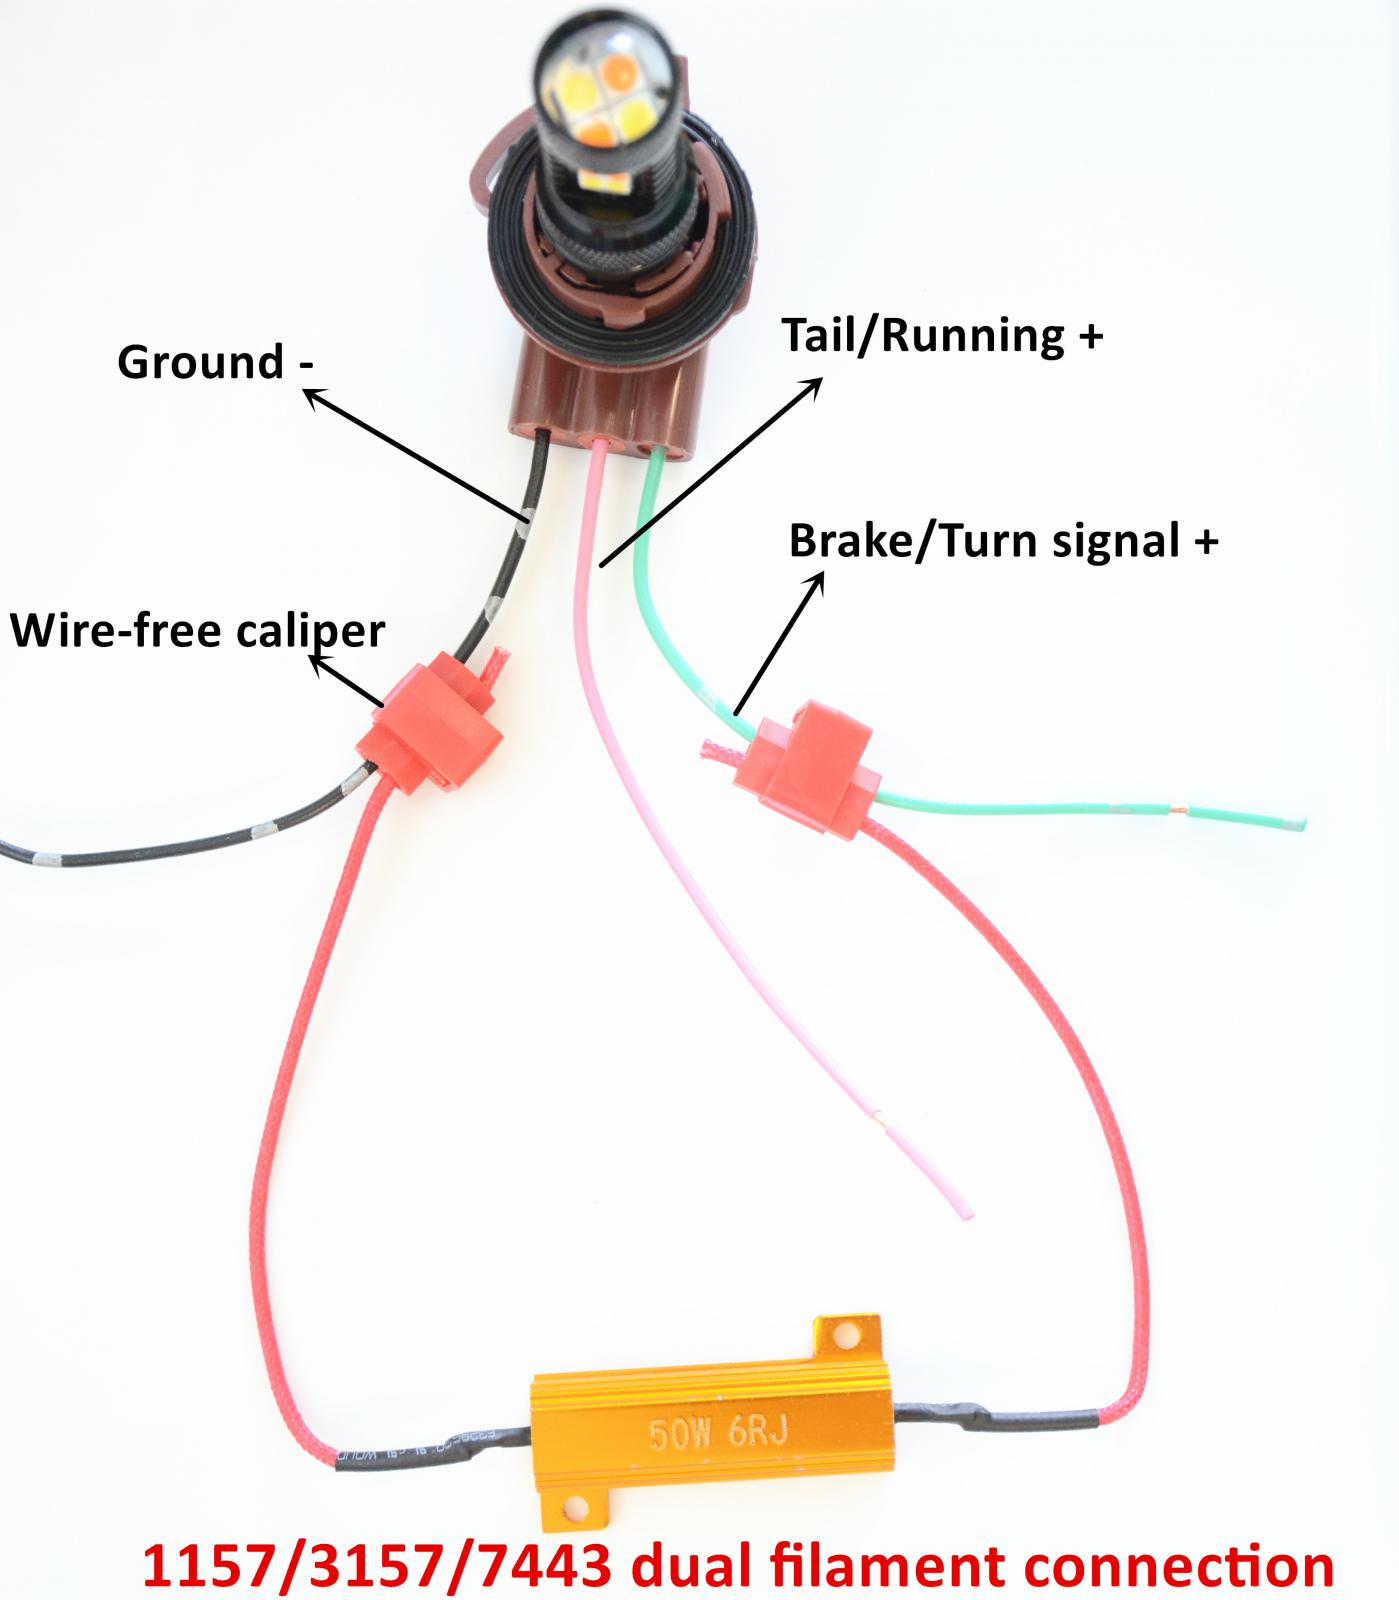 led resistor wiring diagram turn signal bulb 11 18 artatecled resistor wiring diagram turn signal bulb manual e books rh 27 made4dogs de turn signal